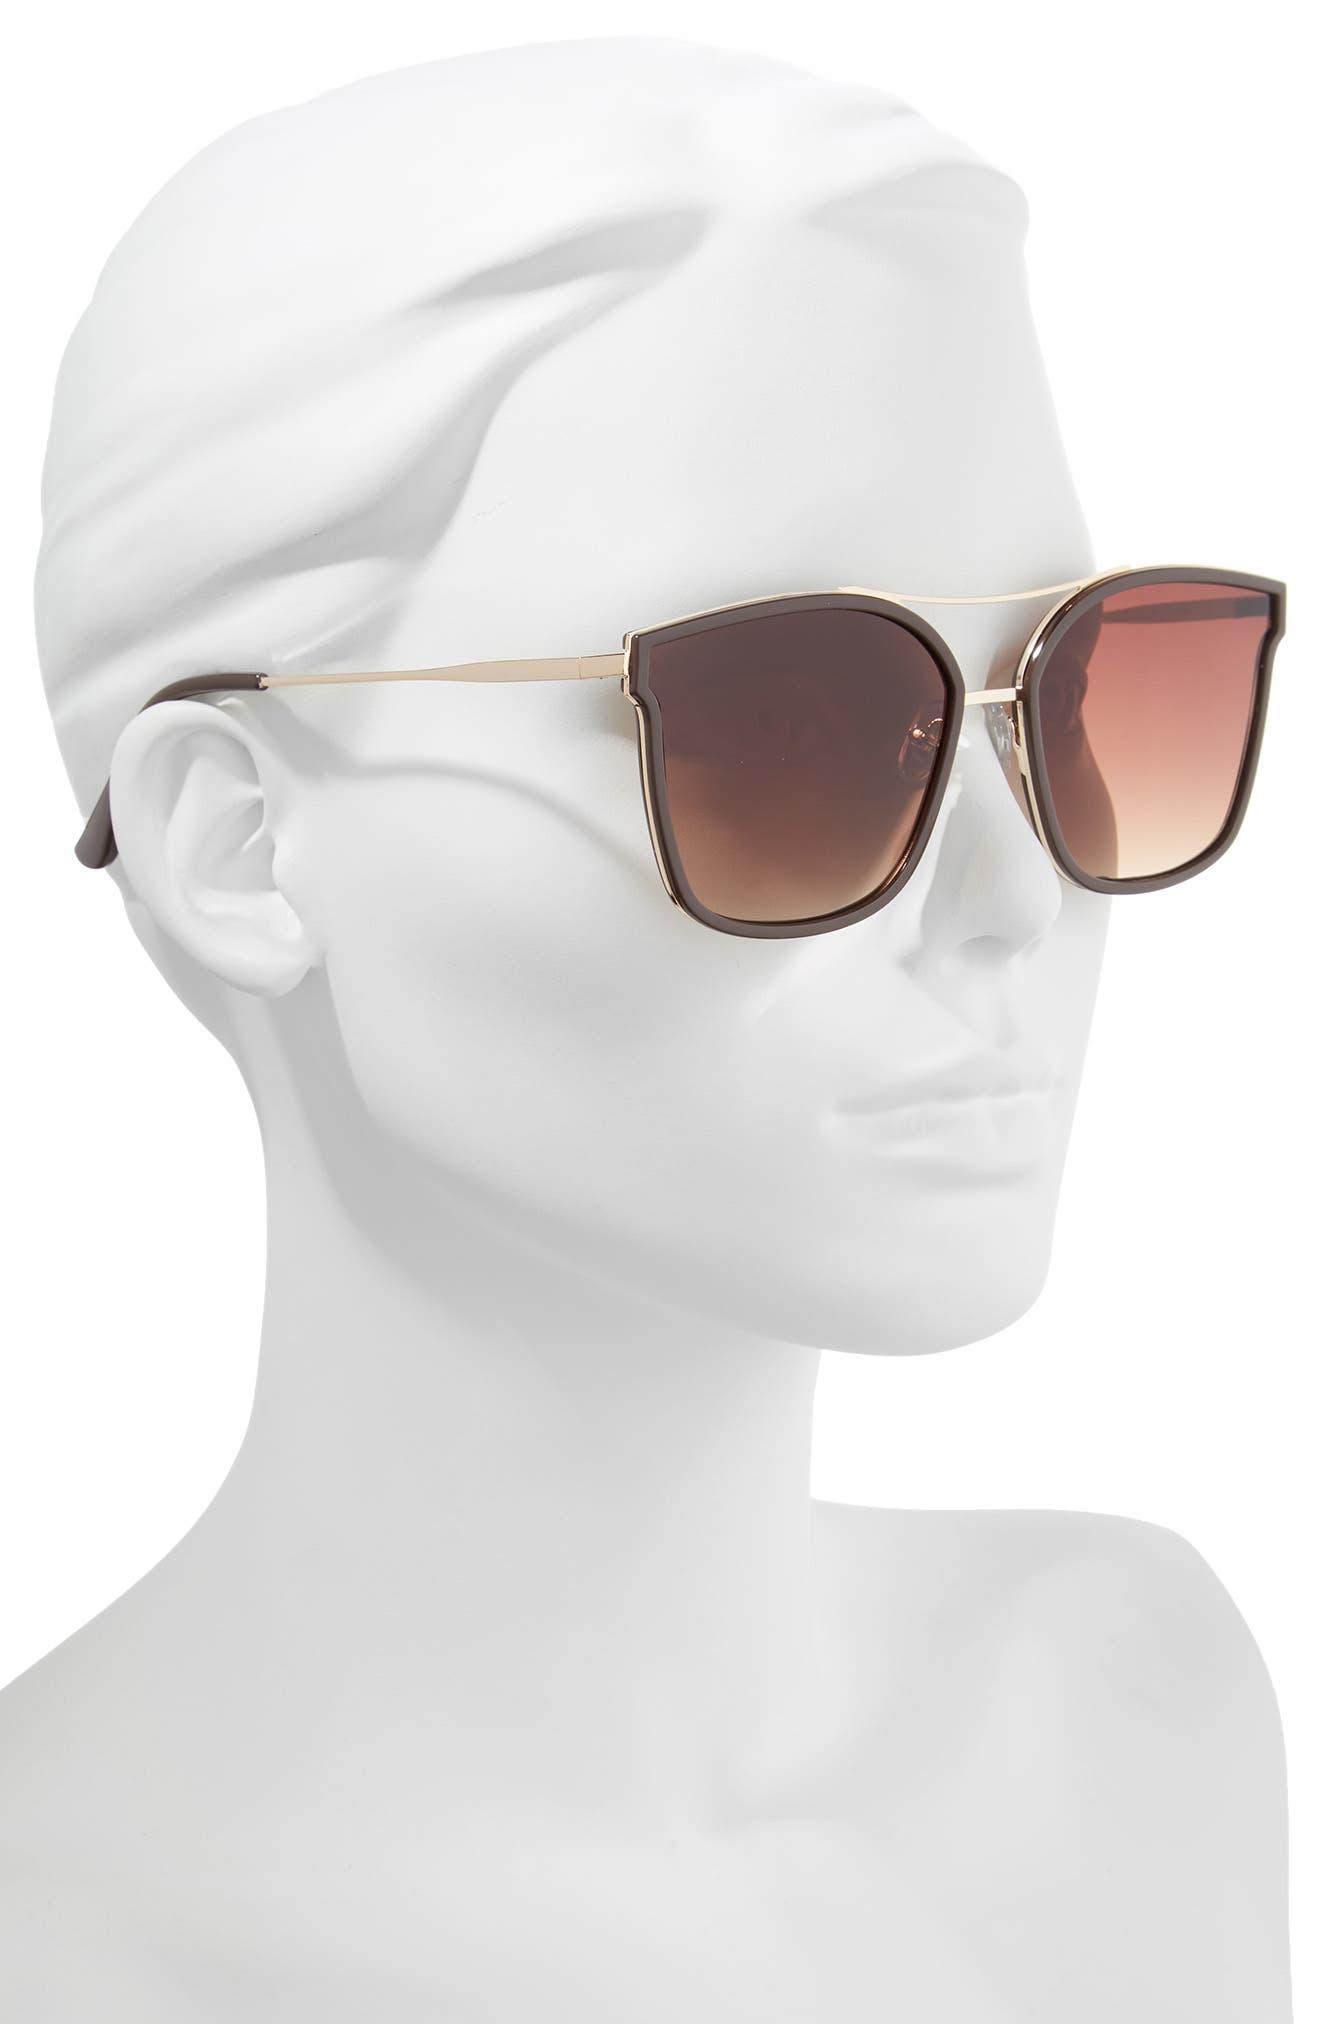 60mm Cat Eye Sunglasses,                             Alternate thumbnail 2, color,                             710